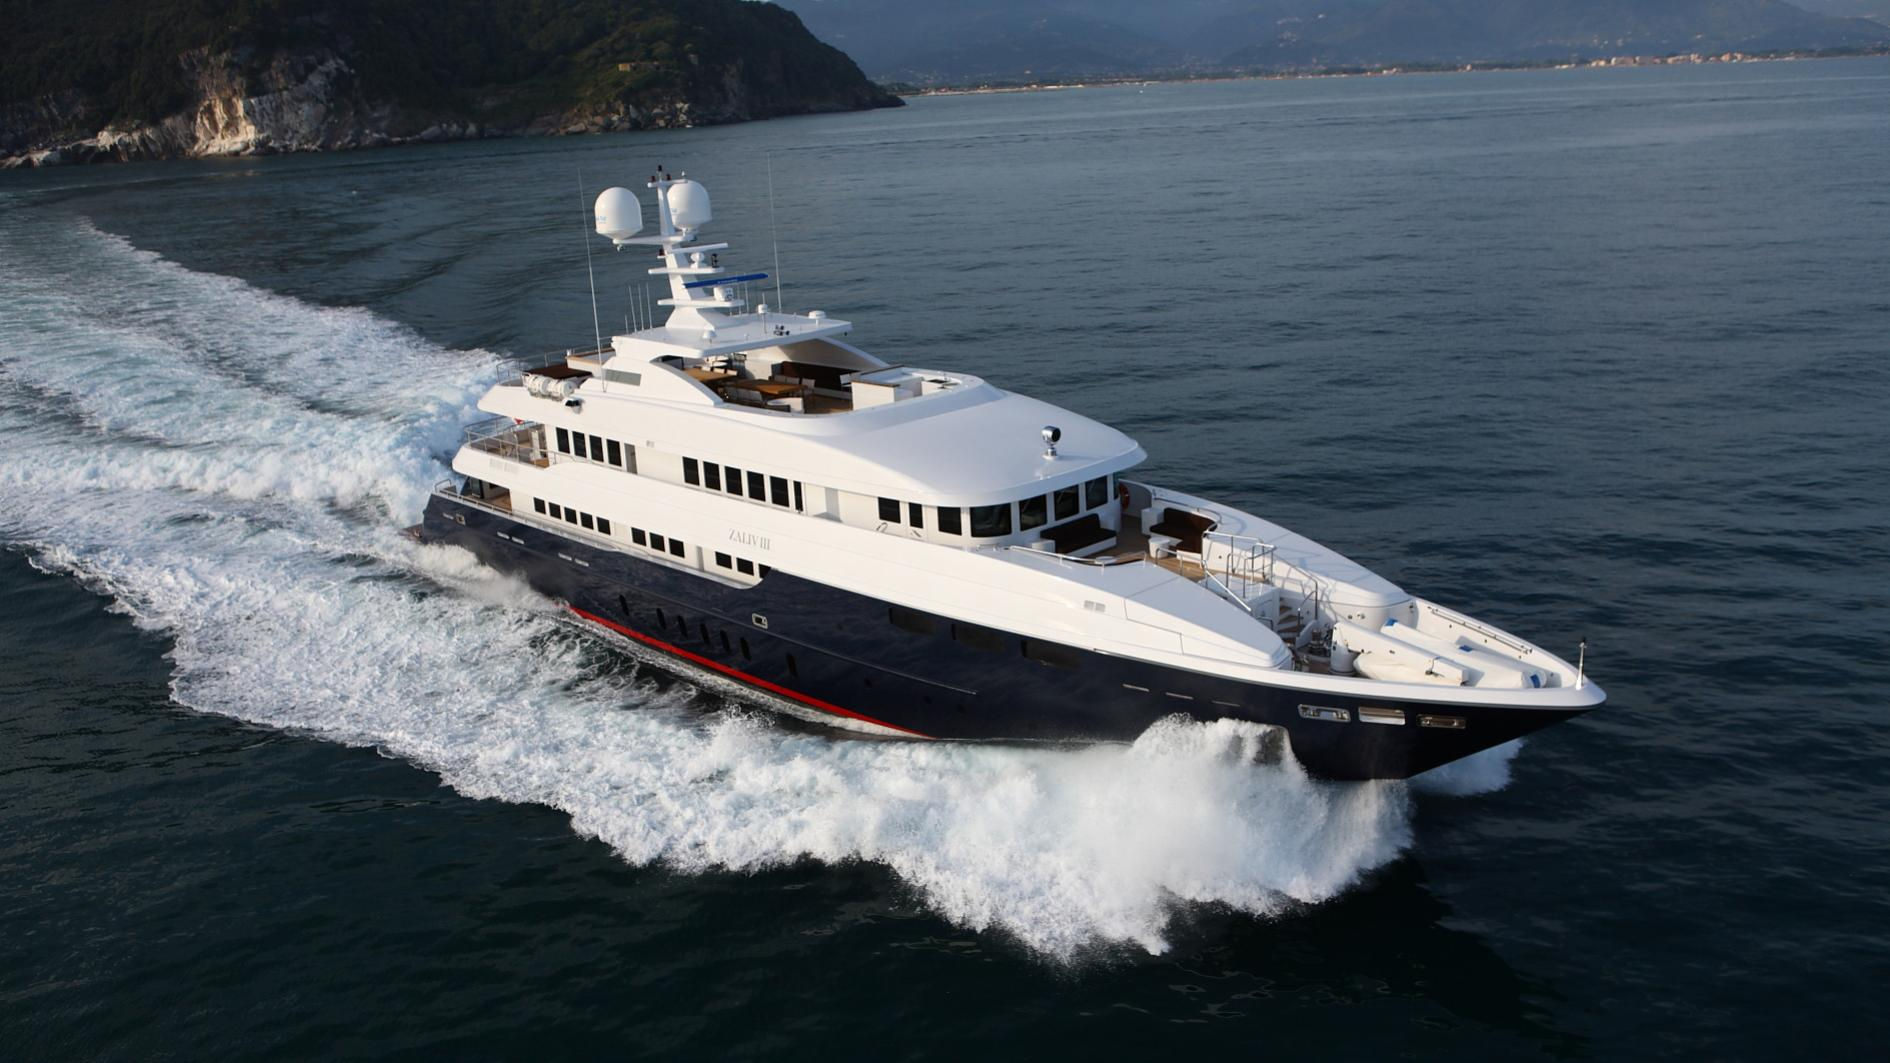 zaliv-iii-yacht-aerial